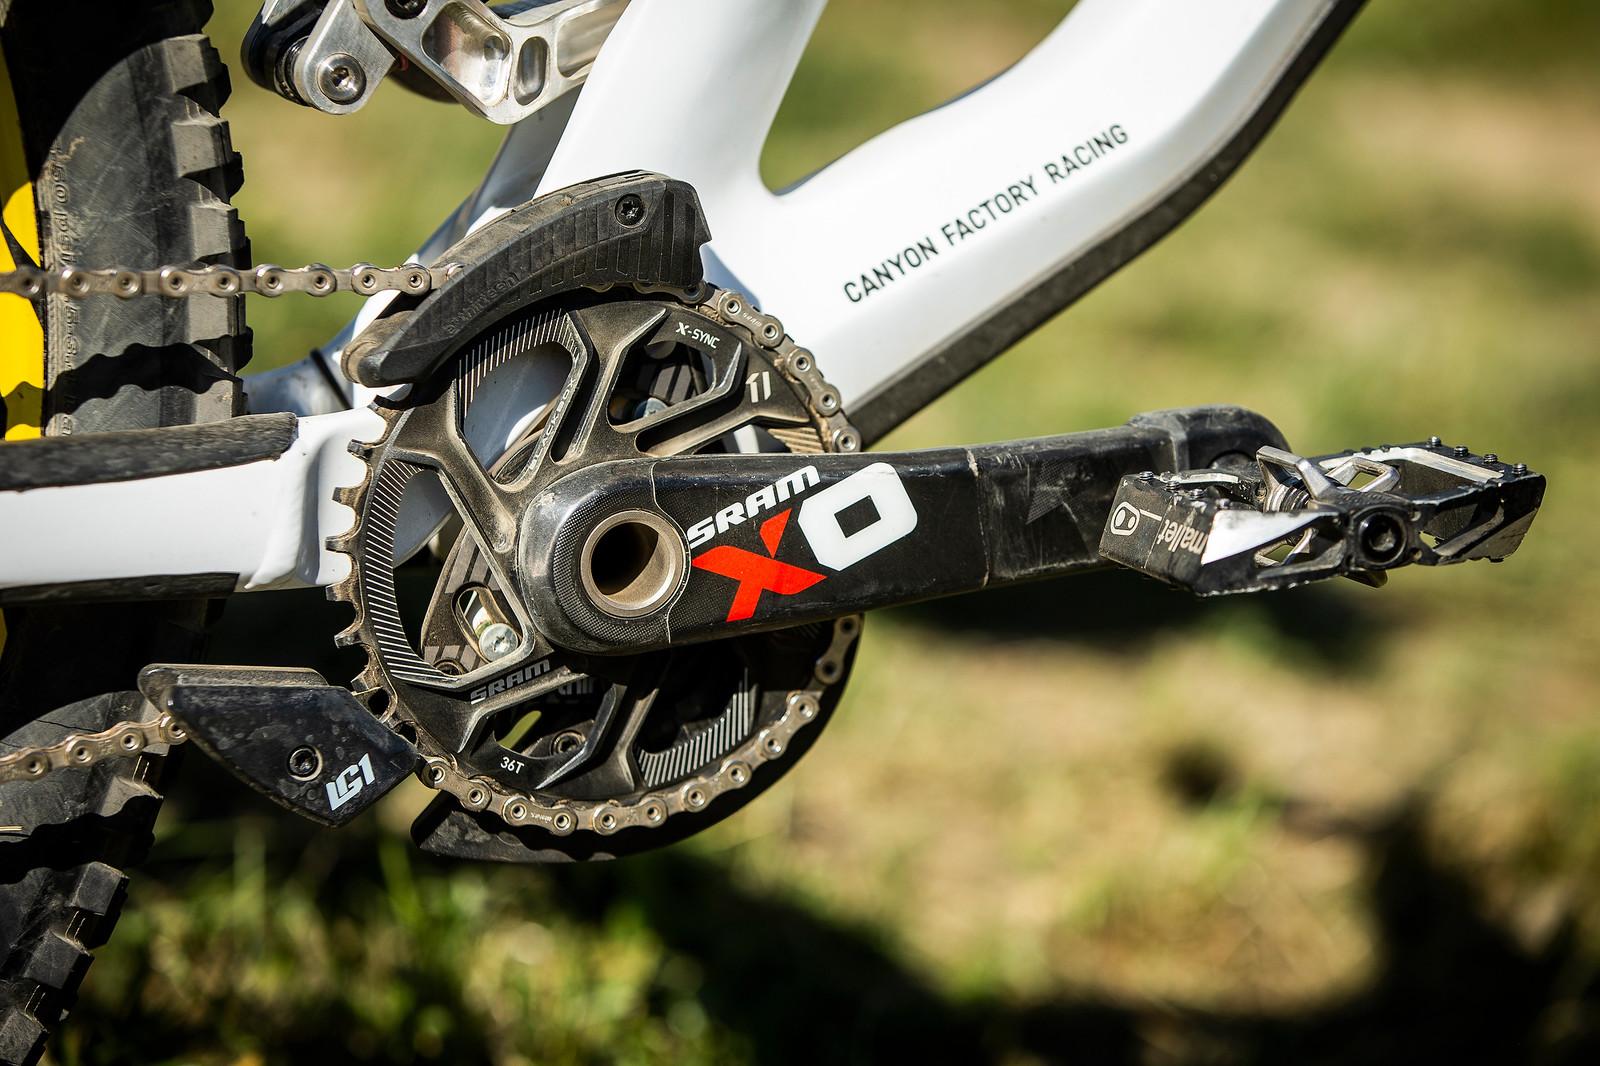 e*thirteen LG1 and SRAM 36t chainring with X0 Carbon Cranks - WINNING BIKE - Troy Brosnan's Canyon Sender - Mountain Biking Pictures - Vital MTB